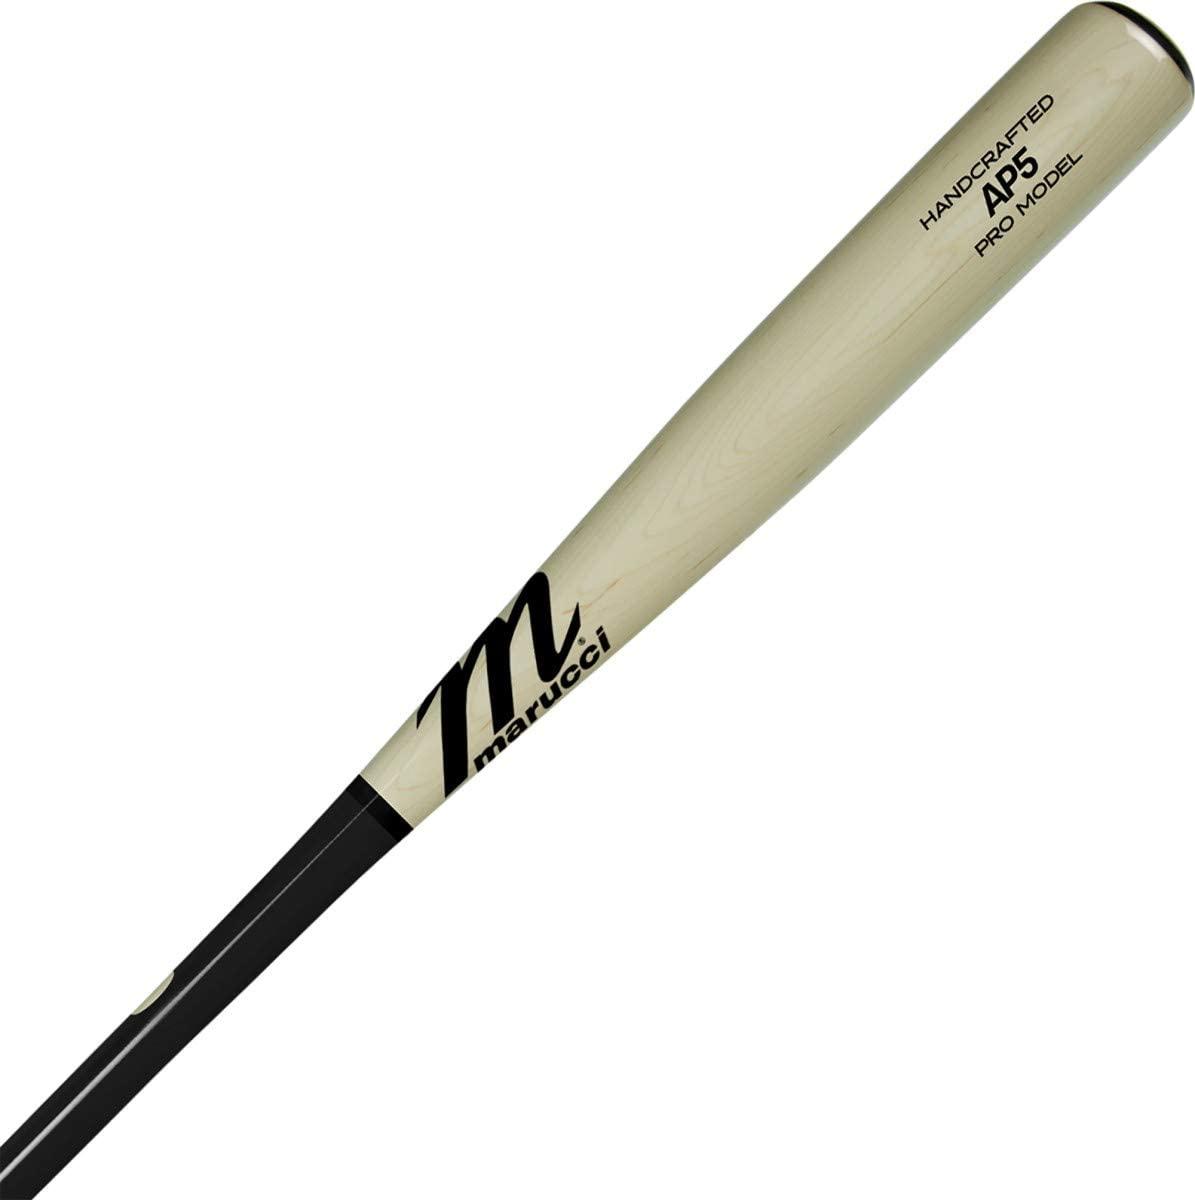 marucci-albert-pujols-pro-model-black-natural-maple-wood-baseball-bat-34-inch MVE2AP5-BKN-34   Mariucci Sports - Albert Pools Pro Model - Black/Natural MVE2AP5-BK/N-34 Baseball